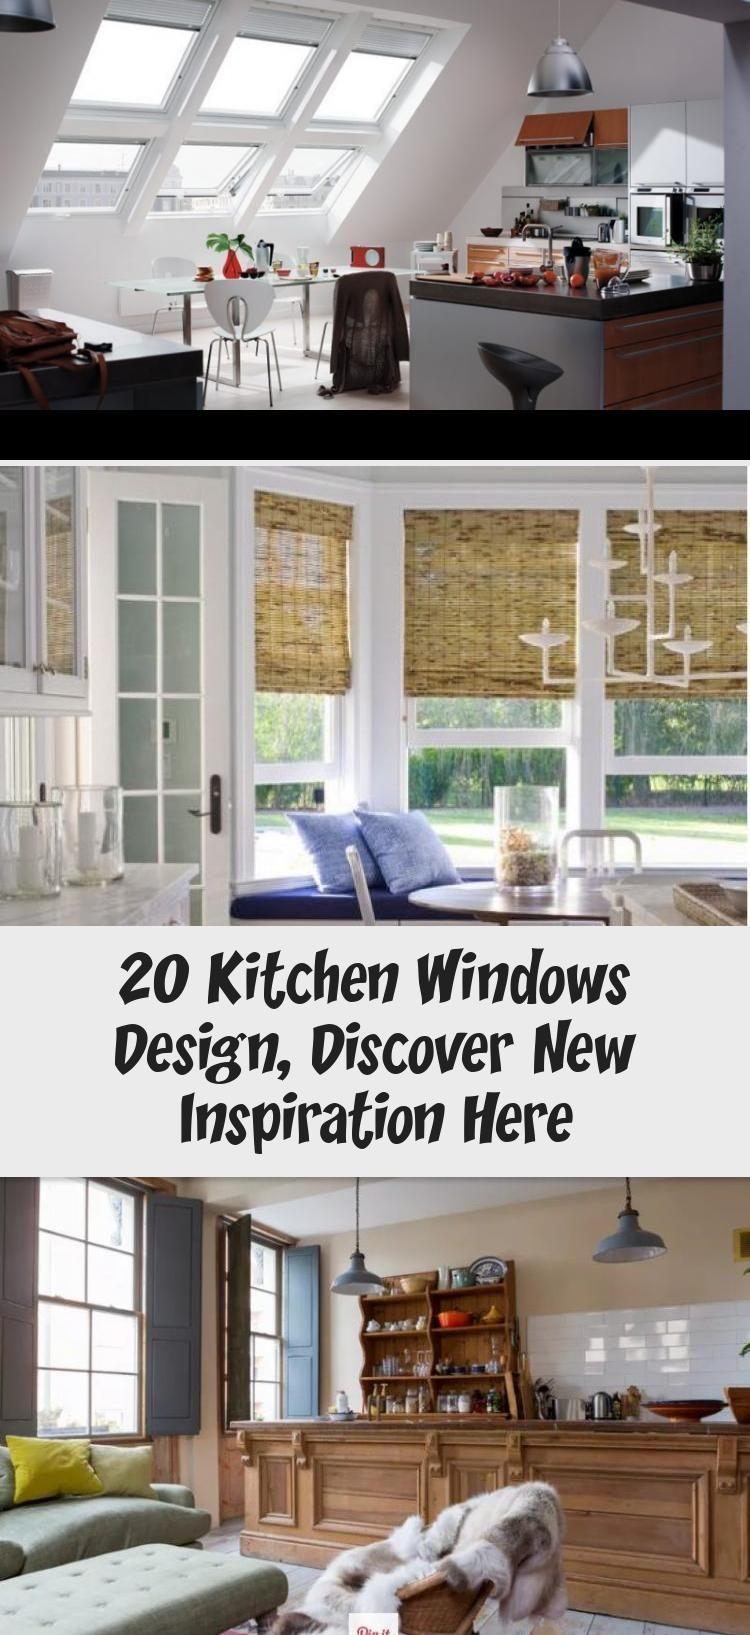 16 Kitchen Windows Design, Discover New Inspiration Here  Kitchen